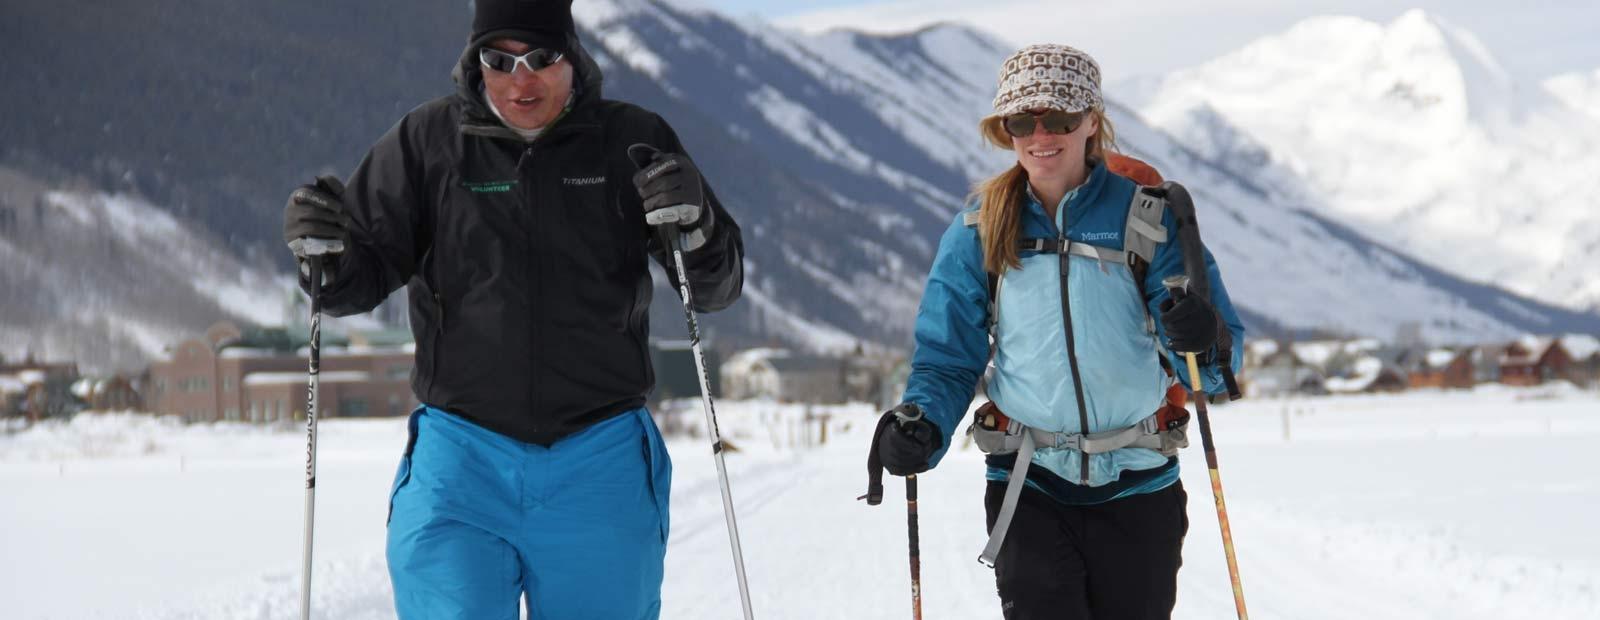 Two people nordic skiing